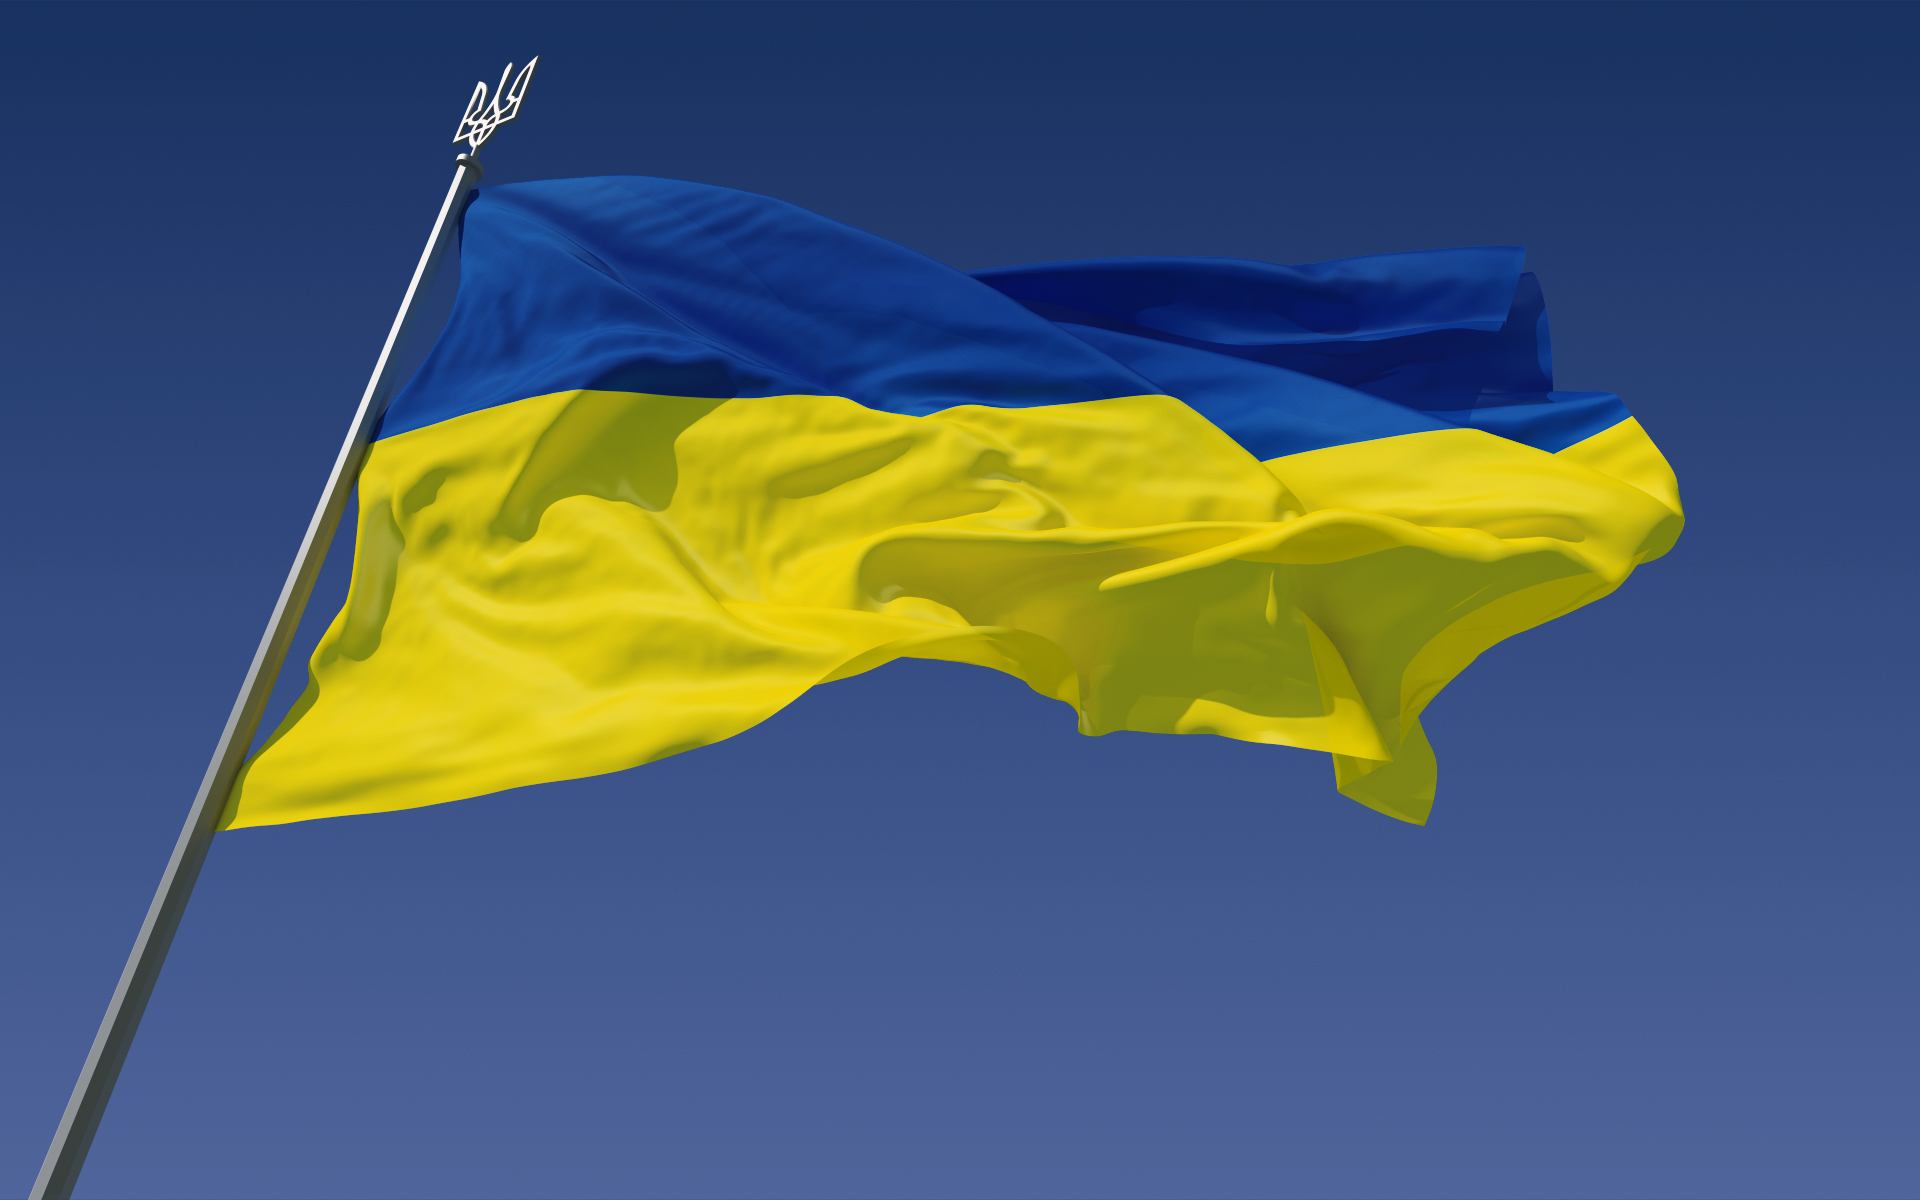 The flag of Ukraine. Wikimedia Commons.